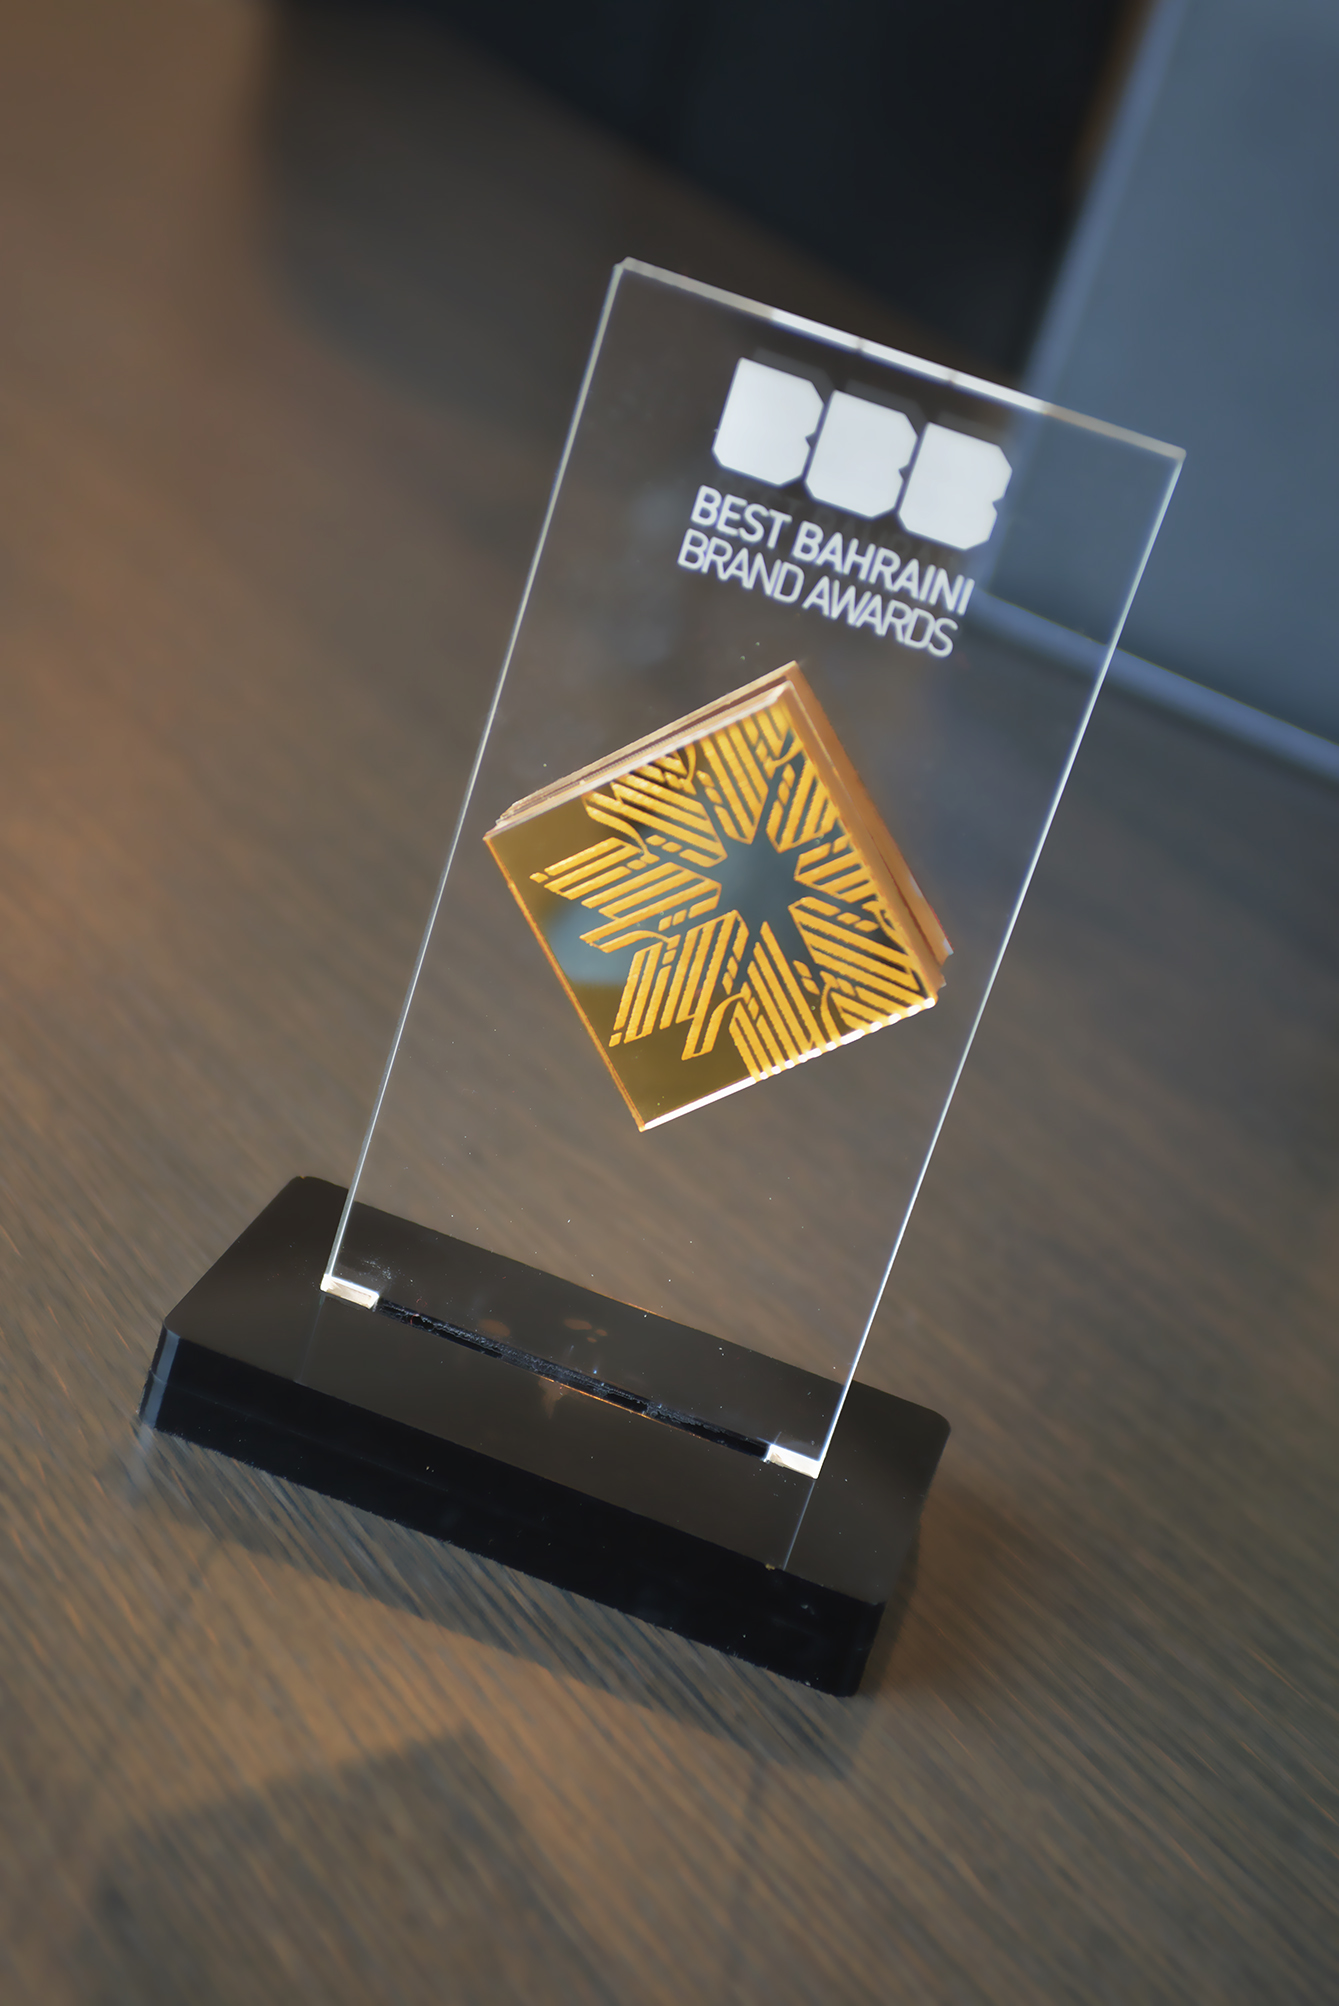 Miracle Receives the Best Bahraini Brand Award for the ArtBahrain logo & Identity.